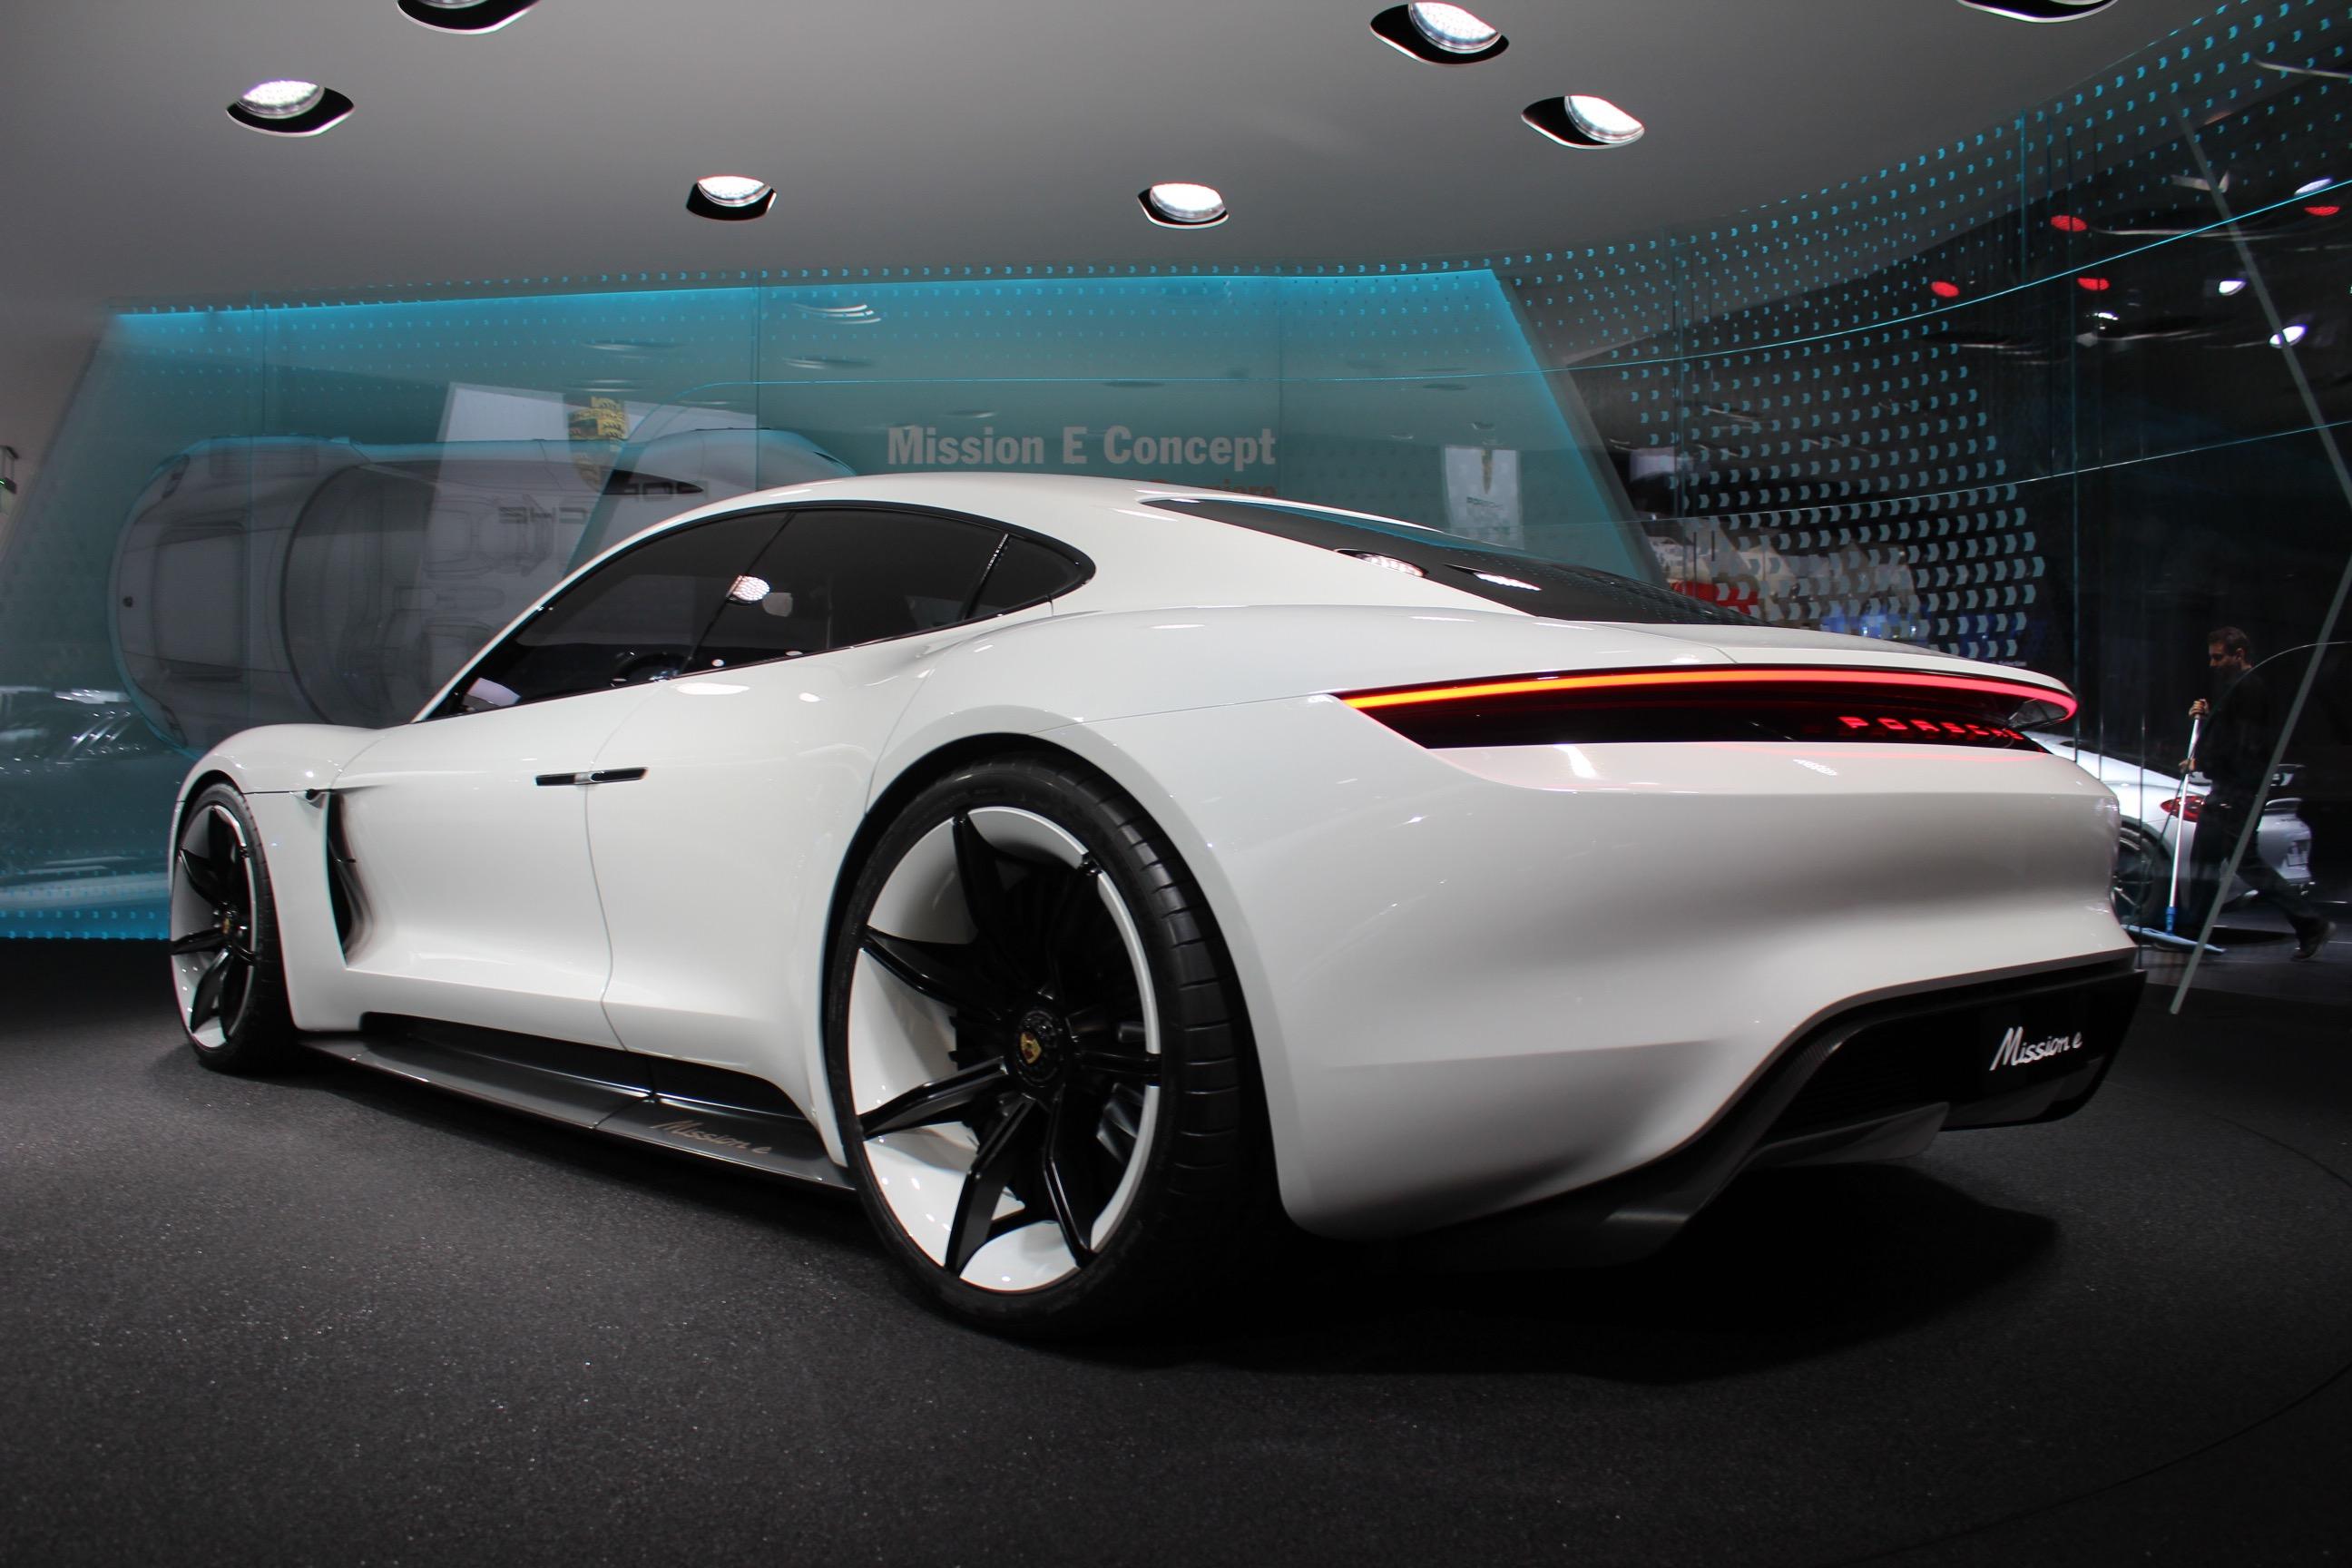 Porsche Design Chief Talks About The Mission E Concept Video